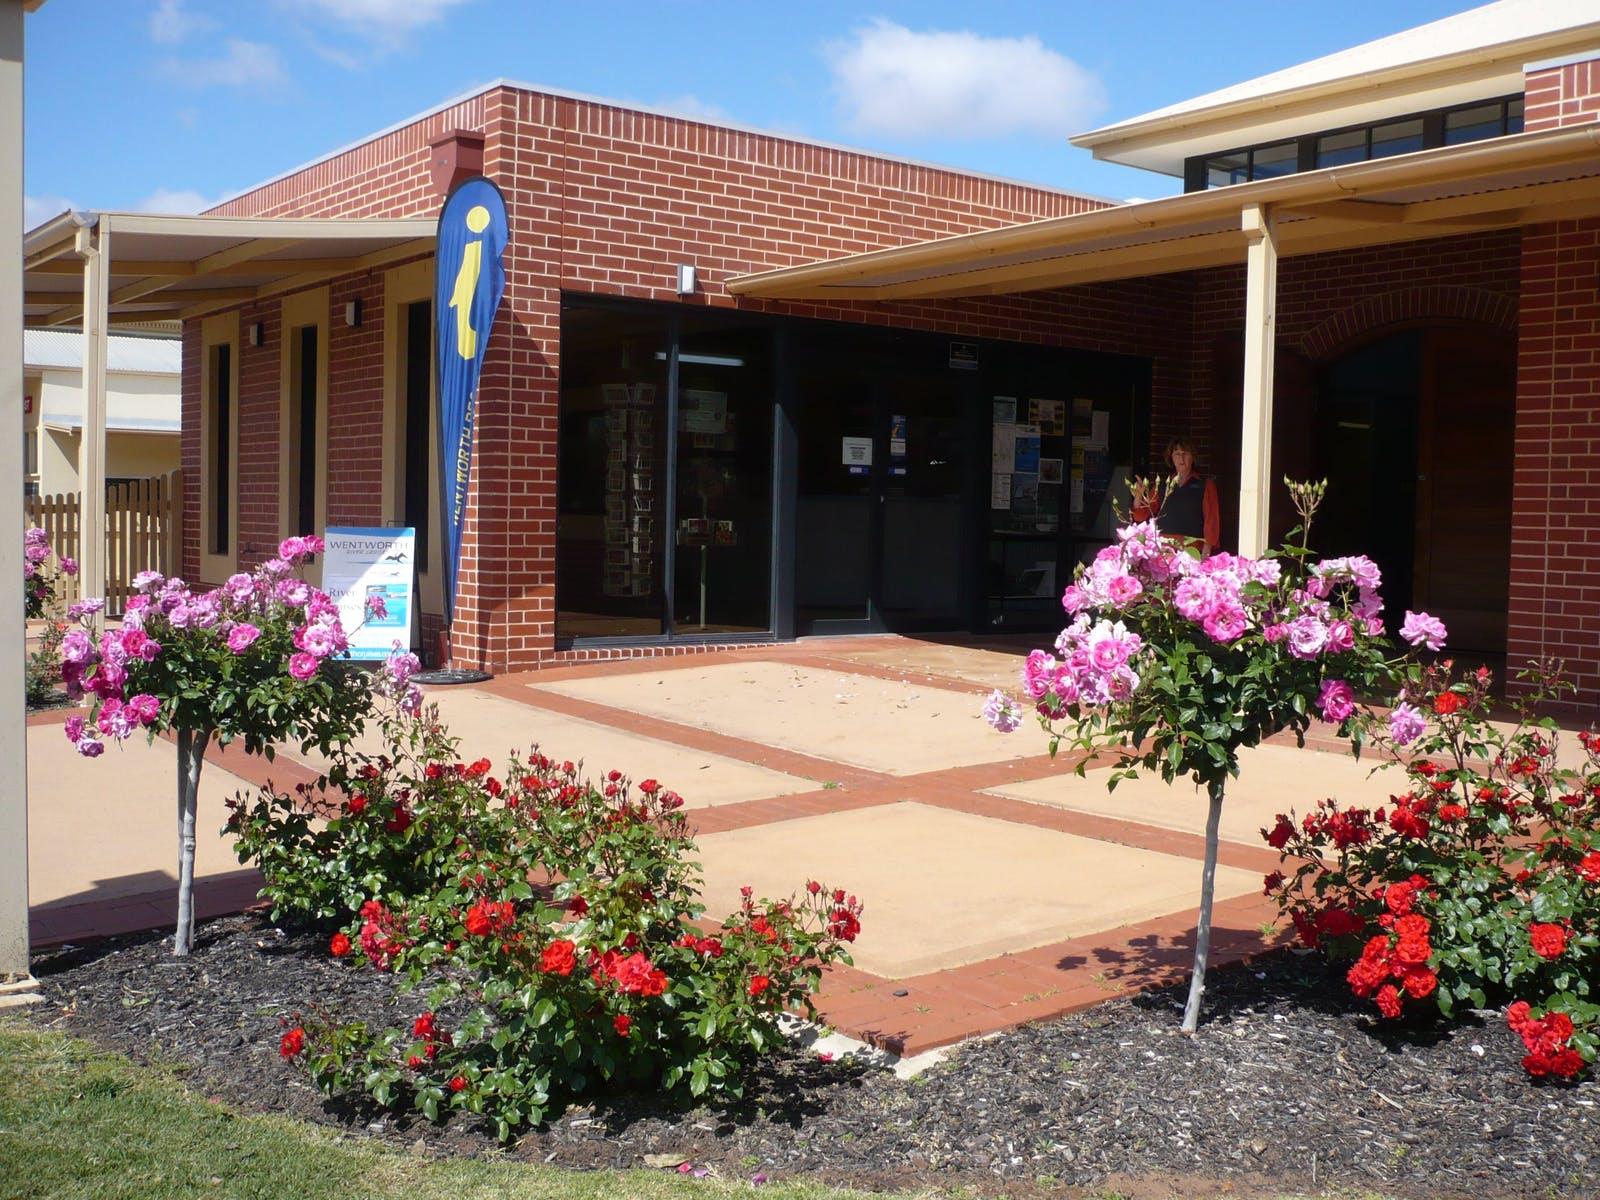 Wentworth Visitor Information Centre